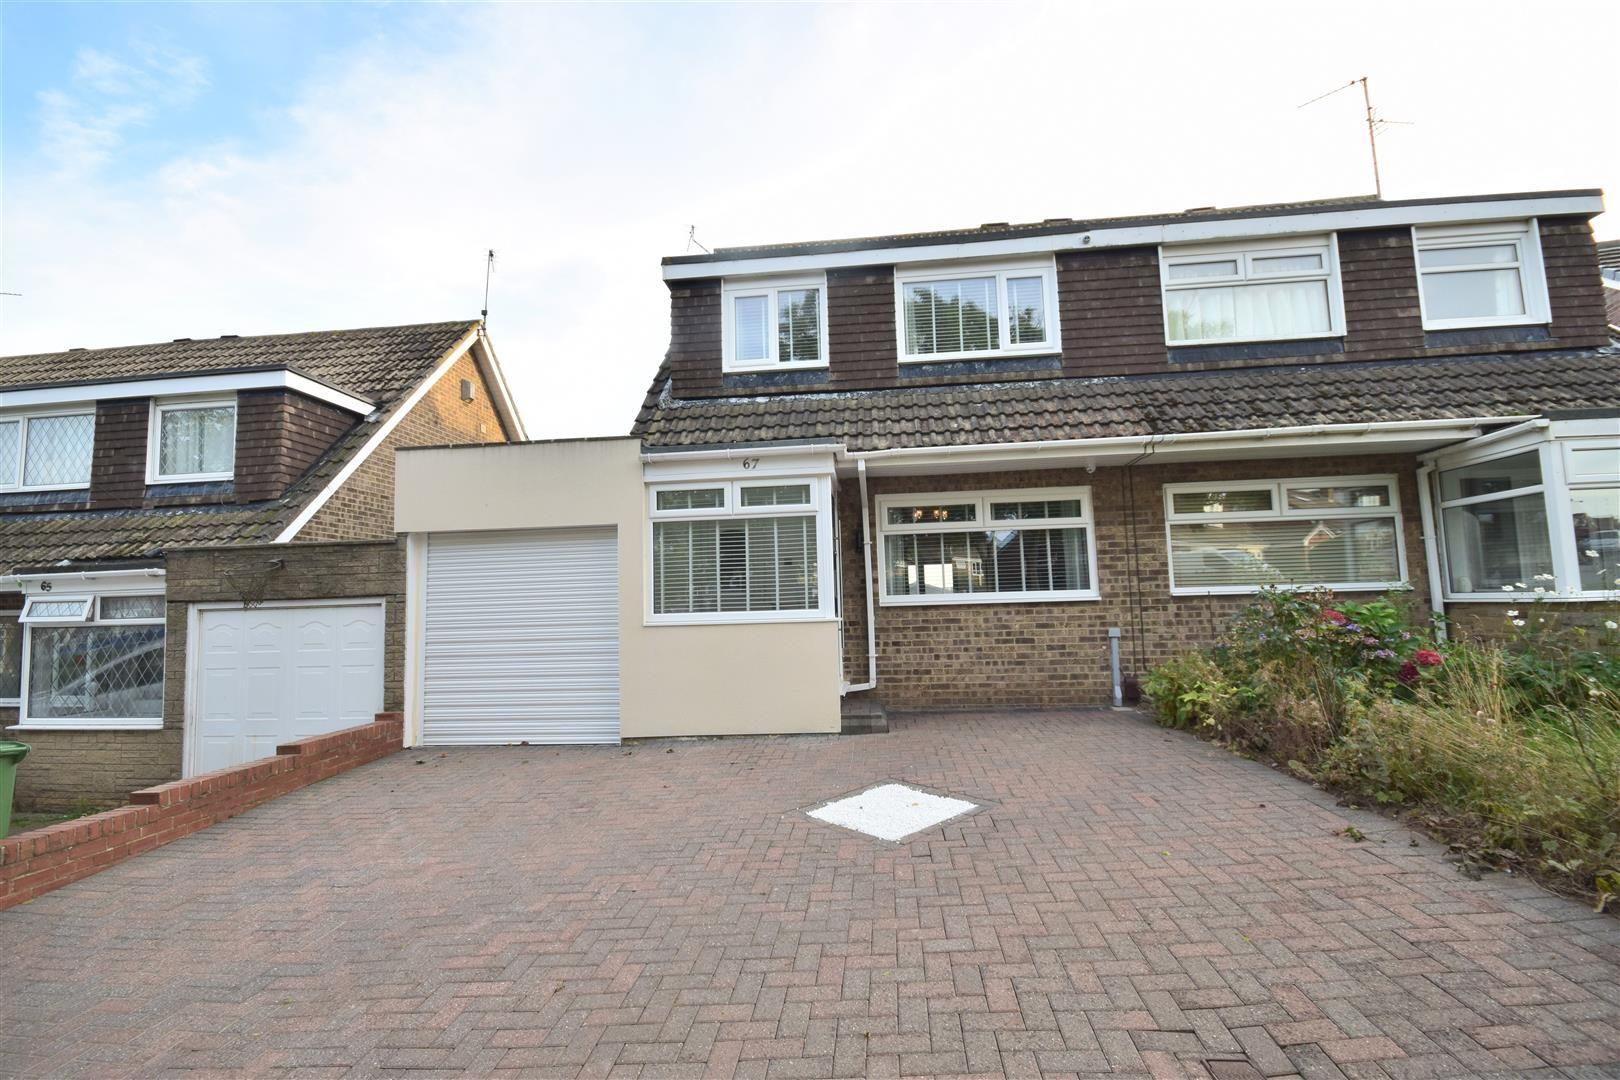 Property photo 1 of 21. Csc_0381.Jpg